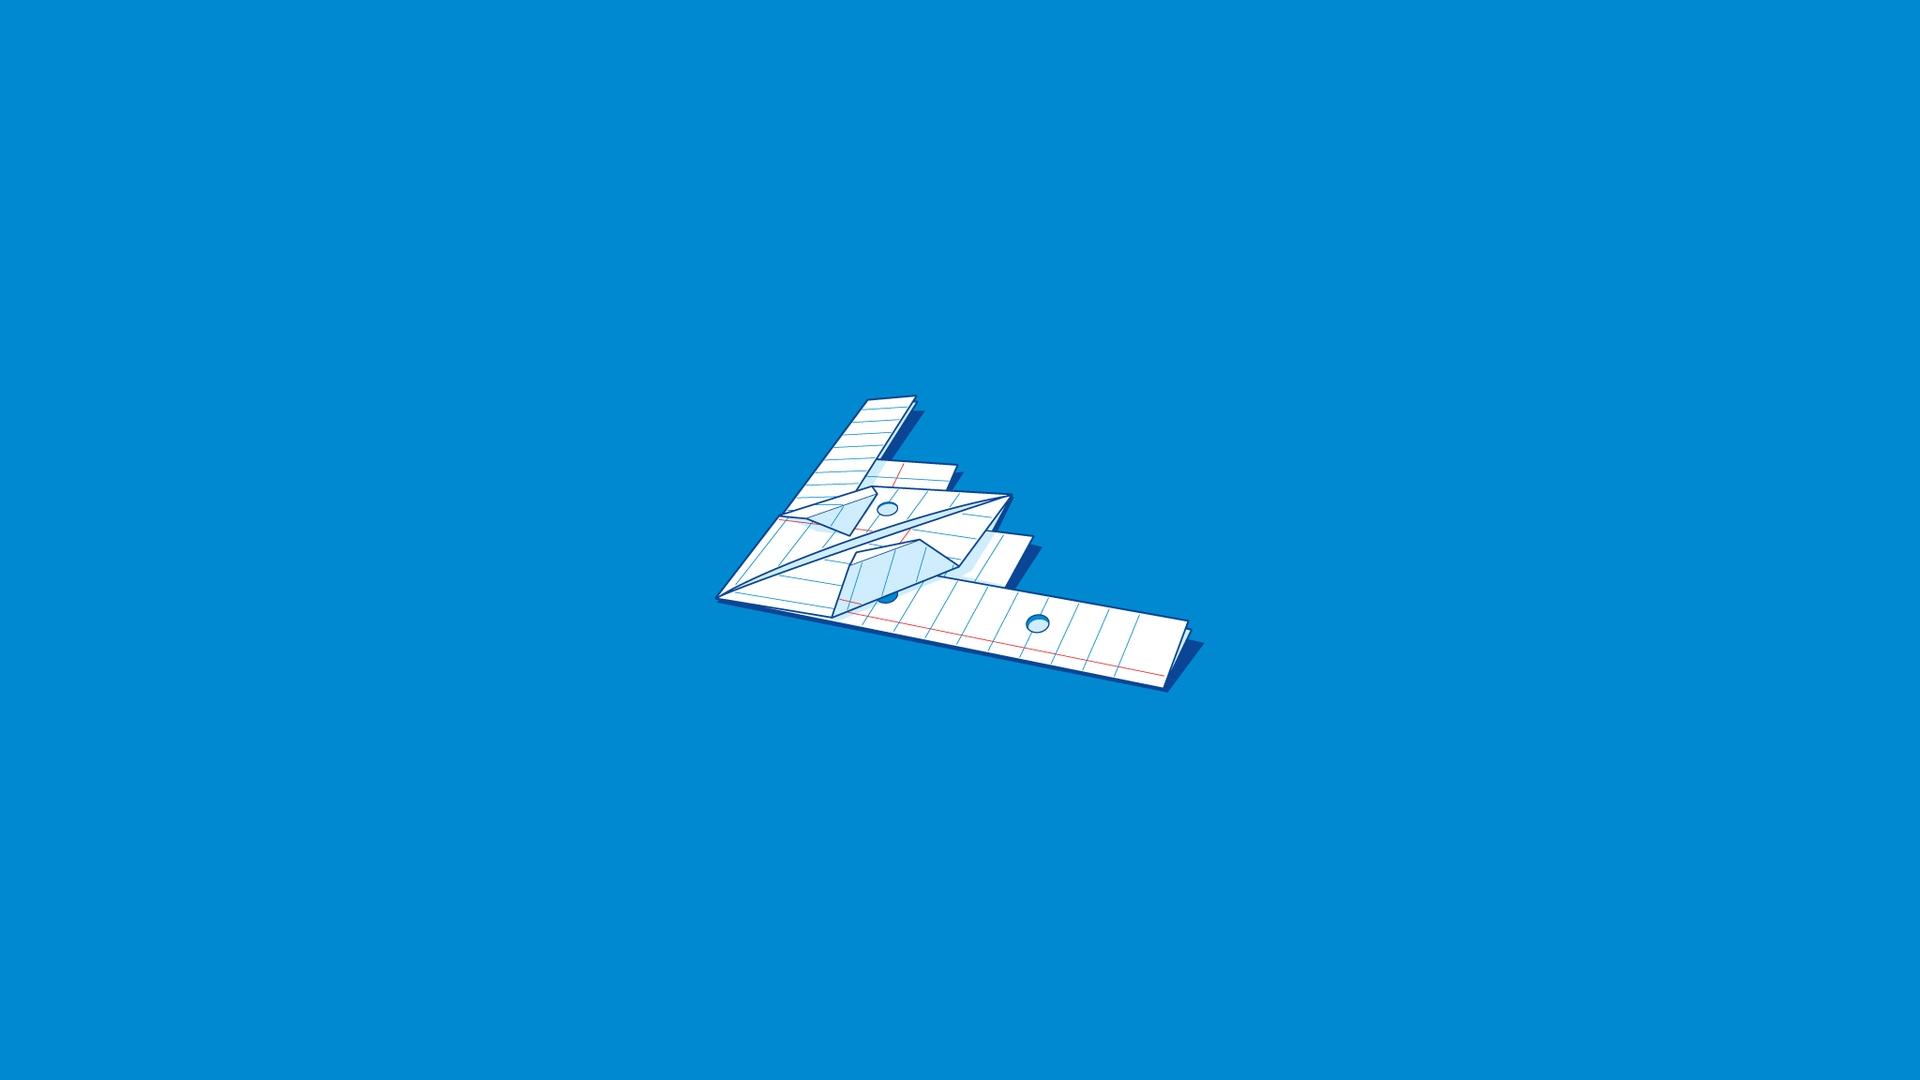 b2 paper airplane wallpaper 58078